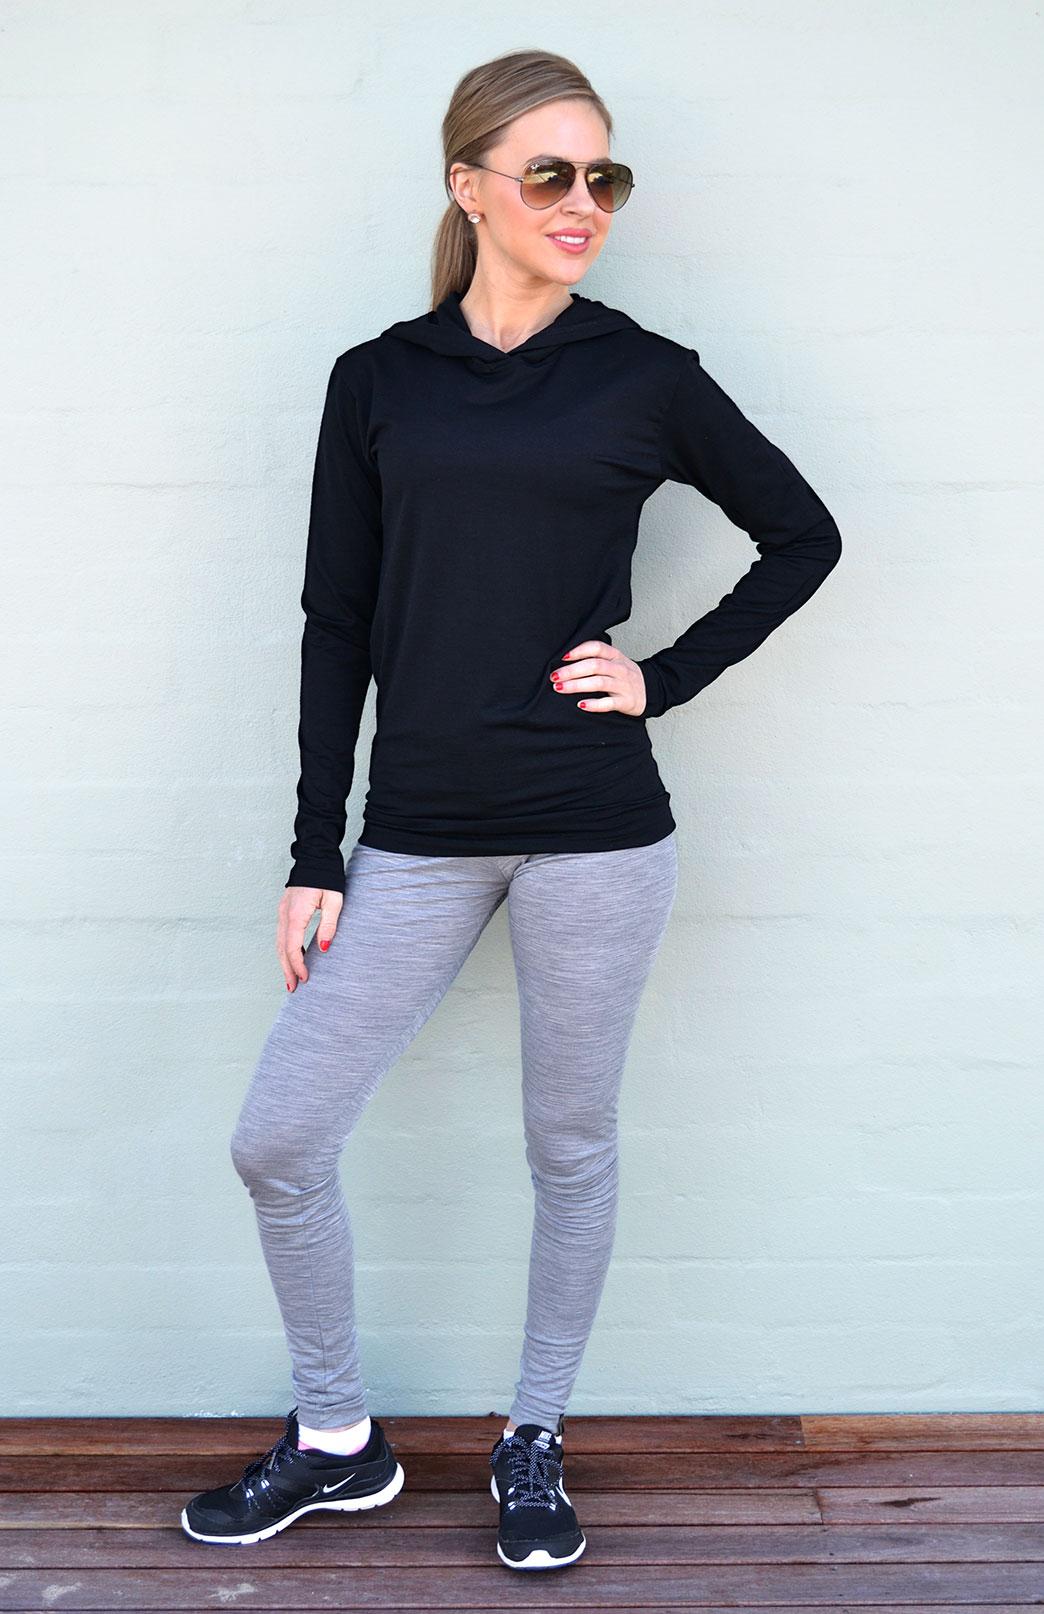 Leggings - Lightweight (180g) - Women's Light Grey Marl Pure Merino Wool Pull On Tights with Elastic Waistband - Smitten Merino Tasmania Australia